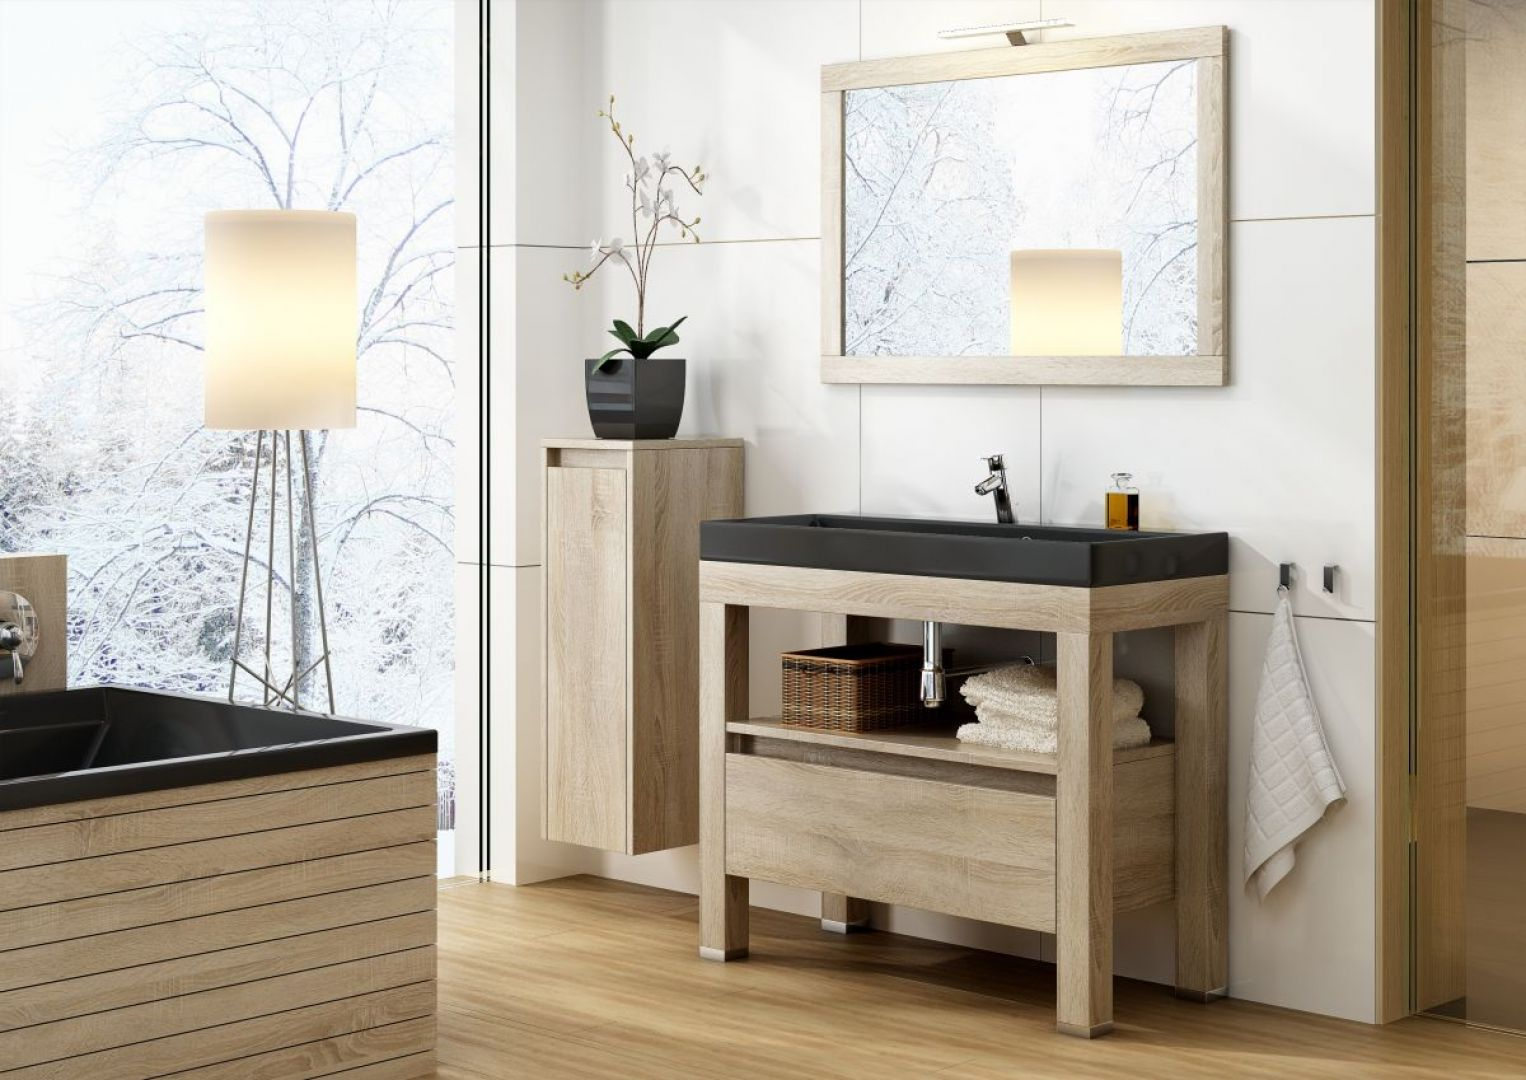 Meble łazienkowe kolorach drewna z kolekcji Ambiente. Fot. Devo